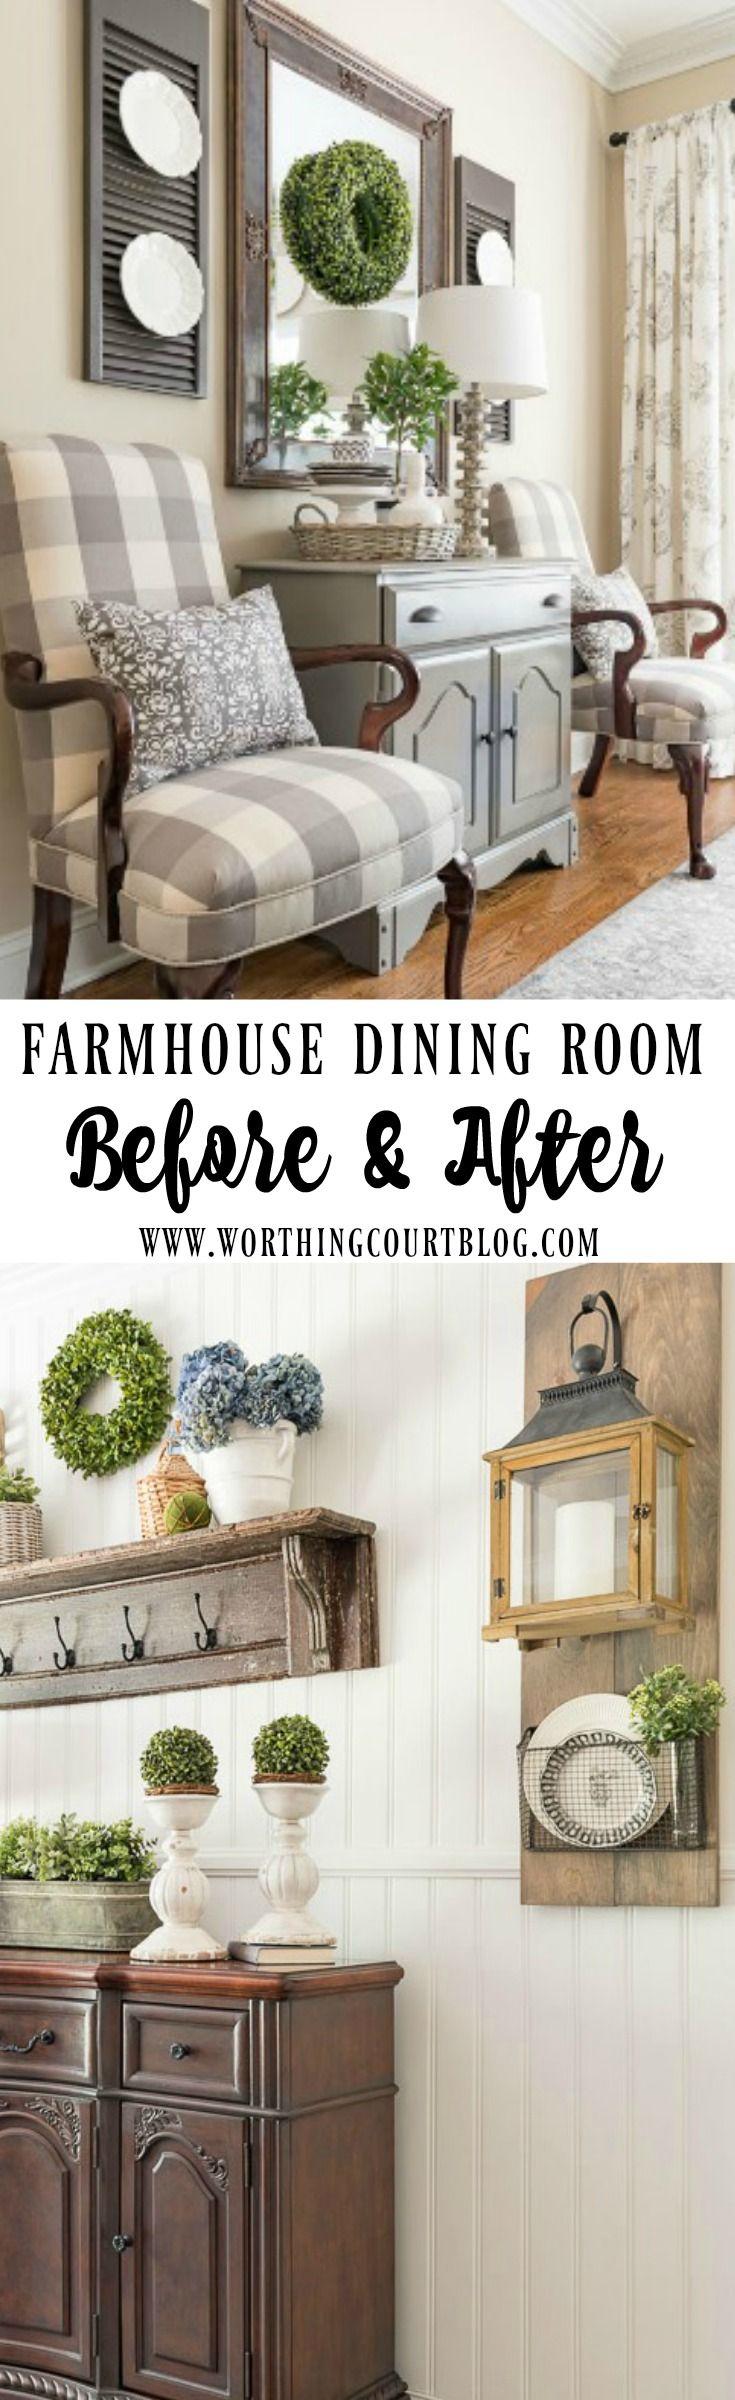 Farmhouse Dining Room Makeover Reveal Before And After Farmhouse Dining Rooms Decor Farmhouse Dining Farm House Living Room